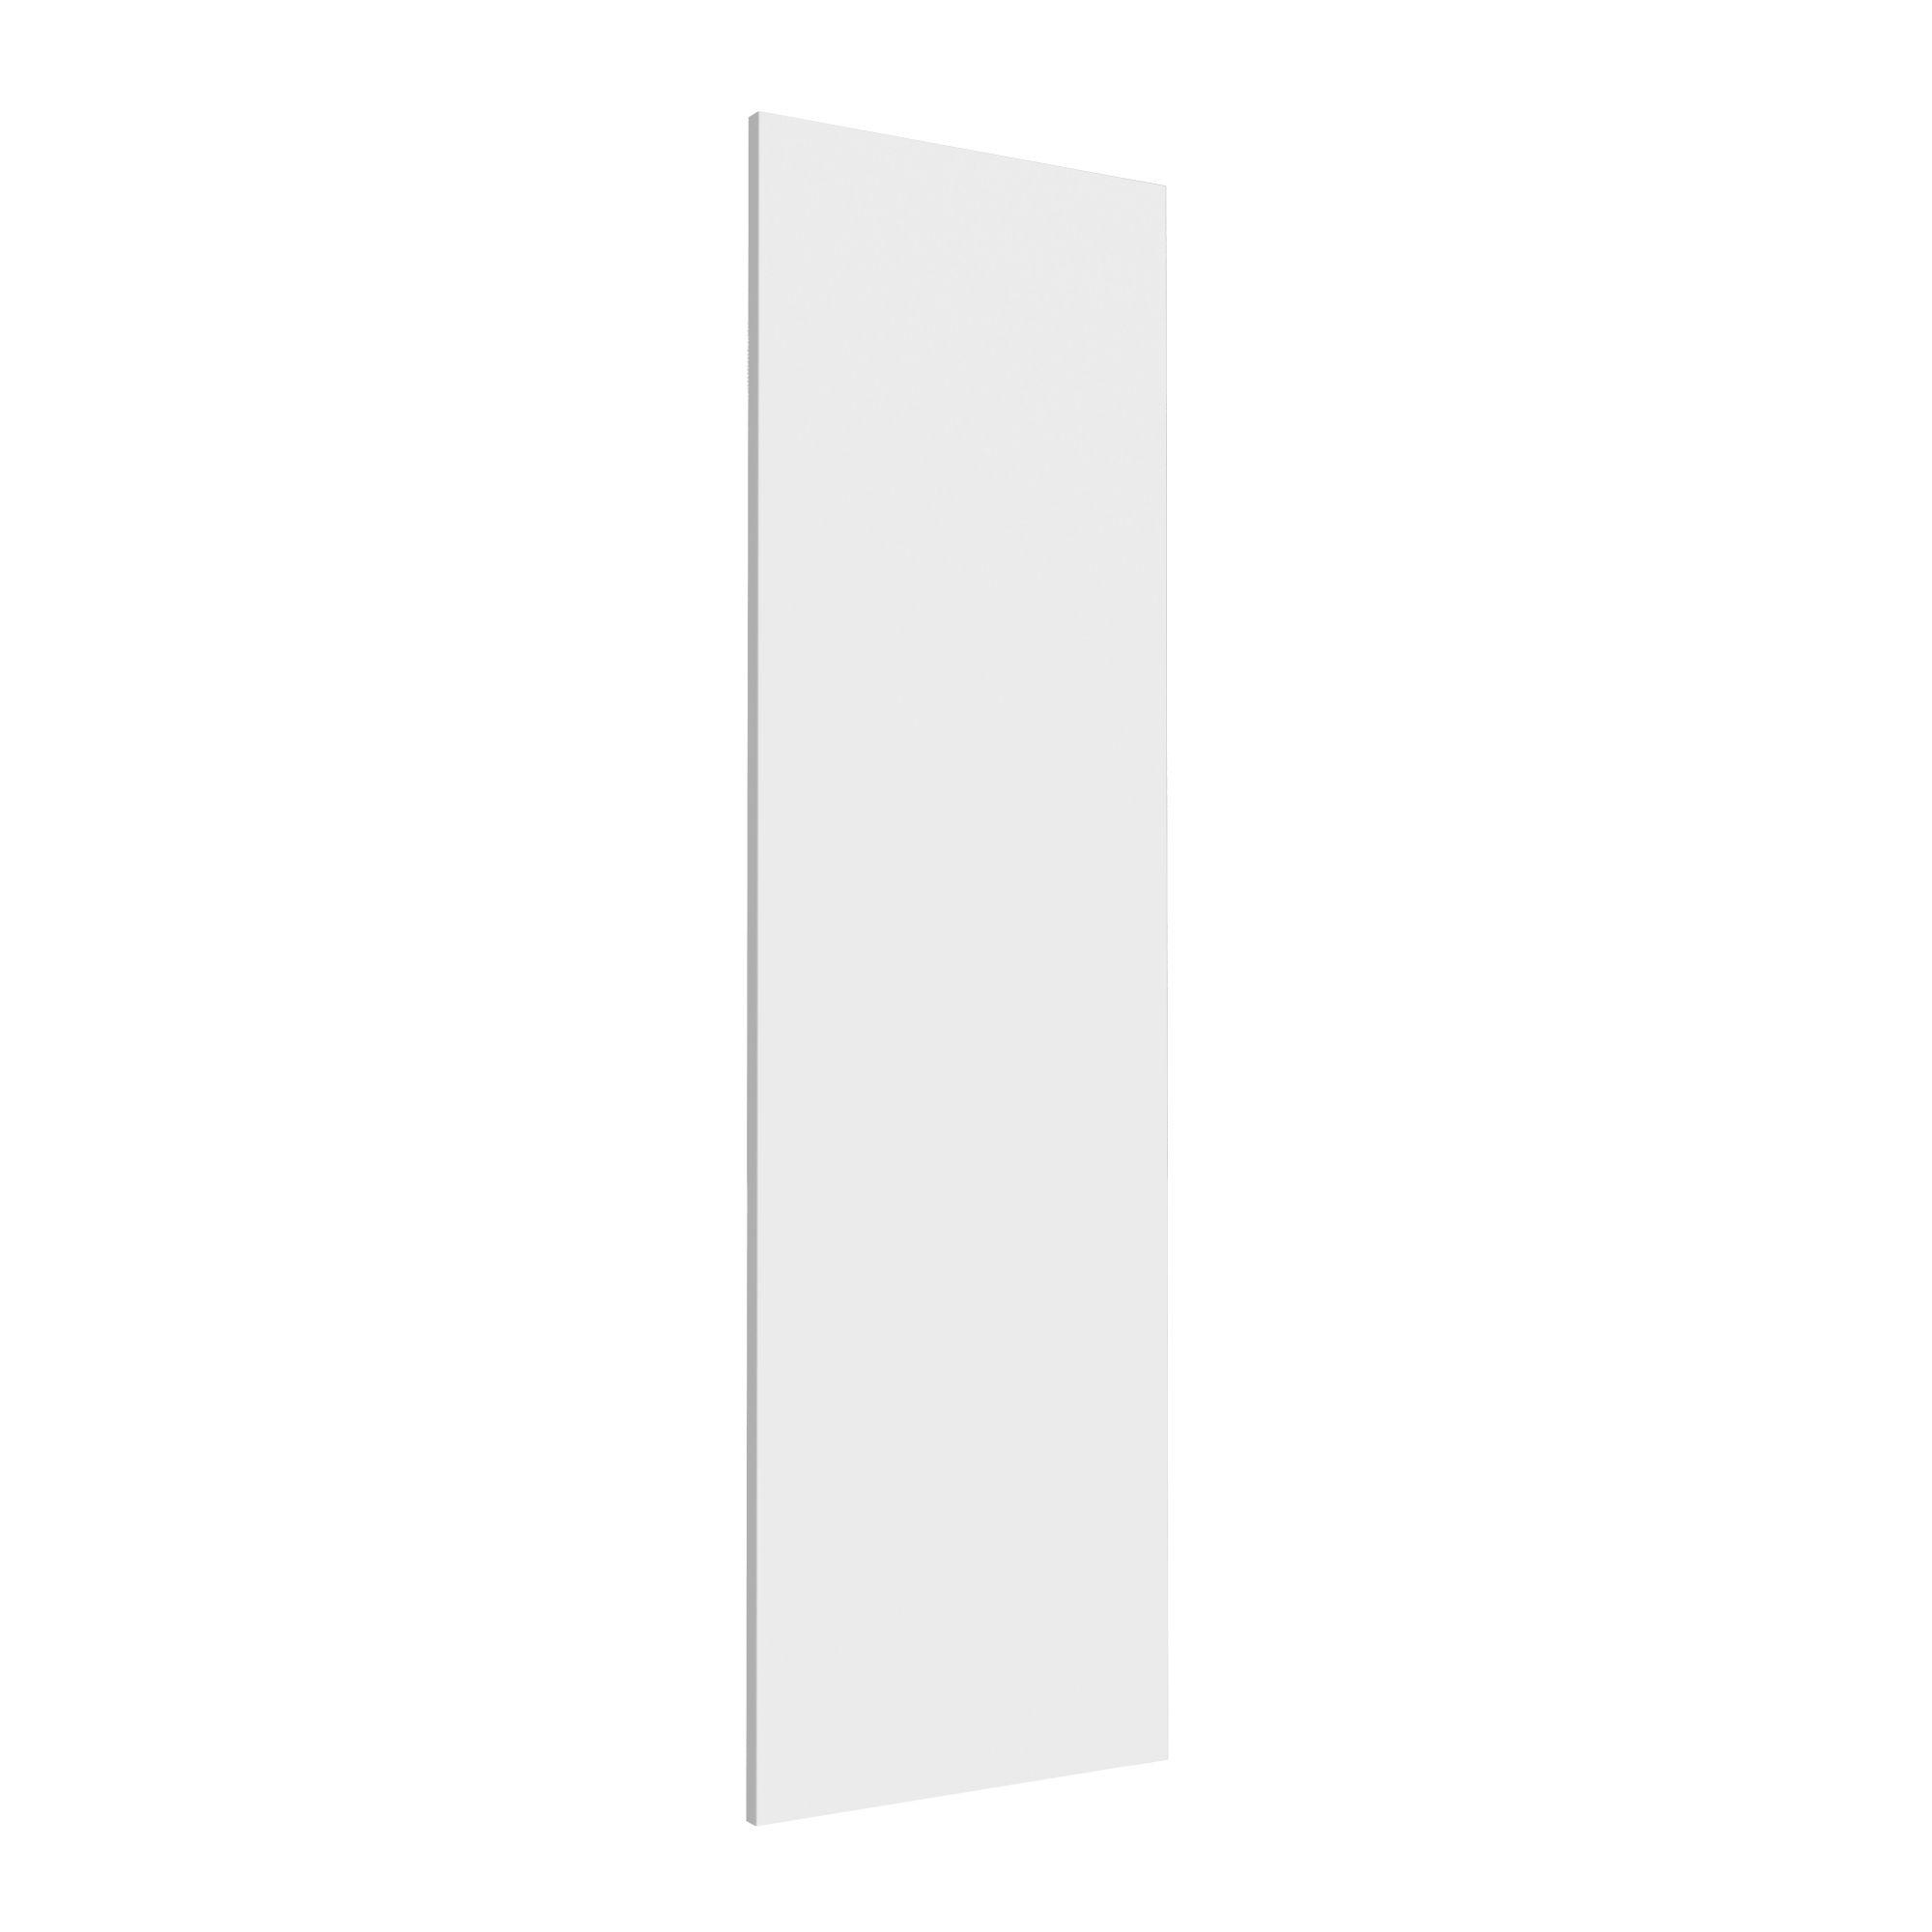 Darwin Modular White & Matt Wardrobe Door (h)1456mm (w)497mm (d)16mm